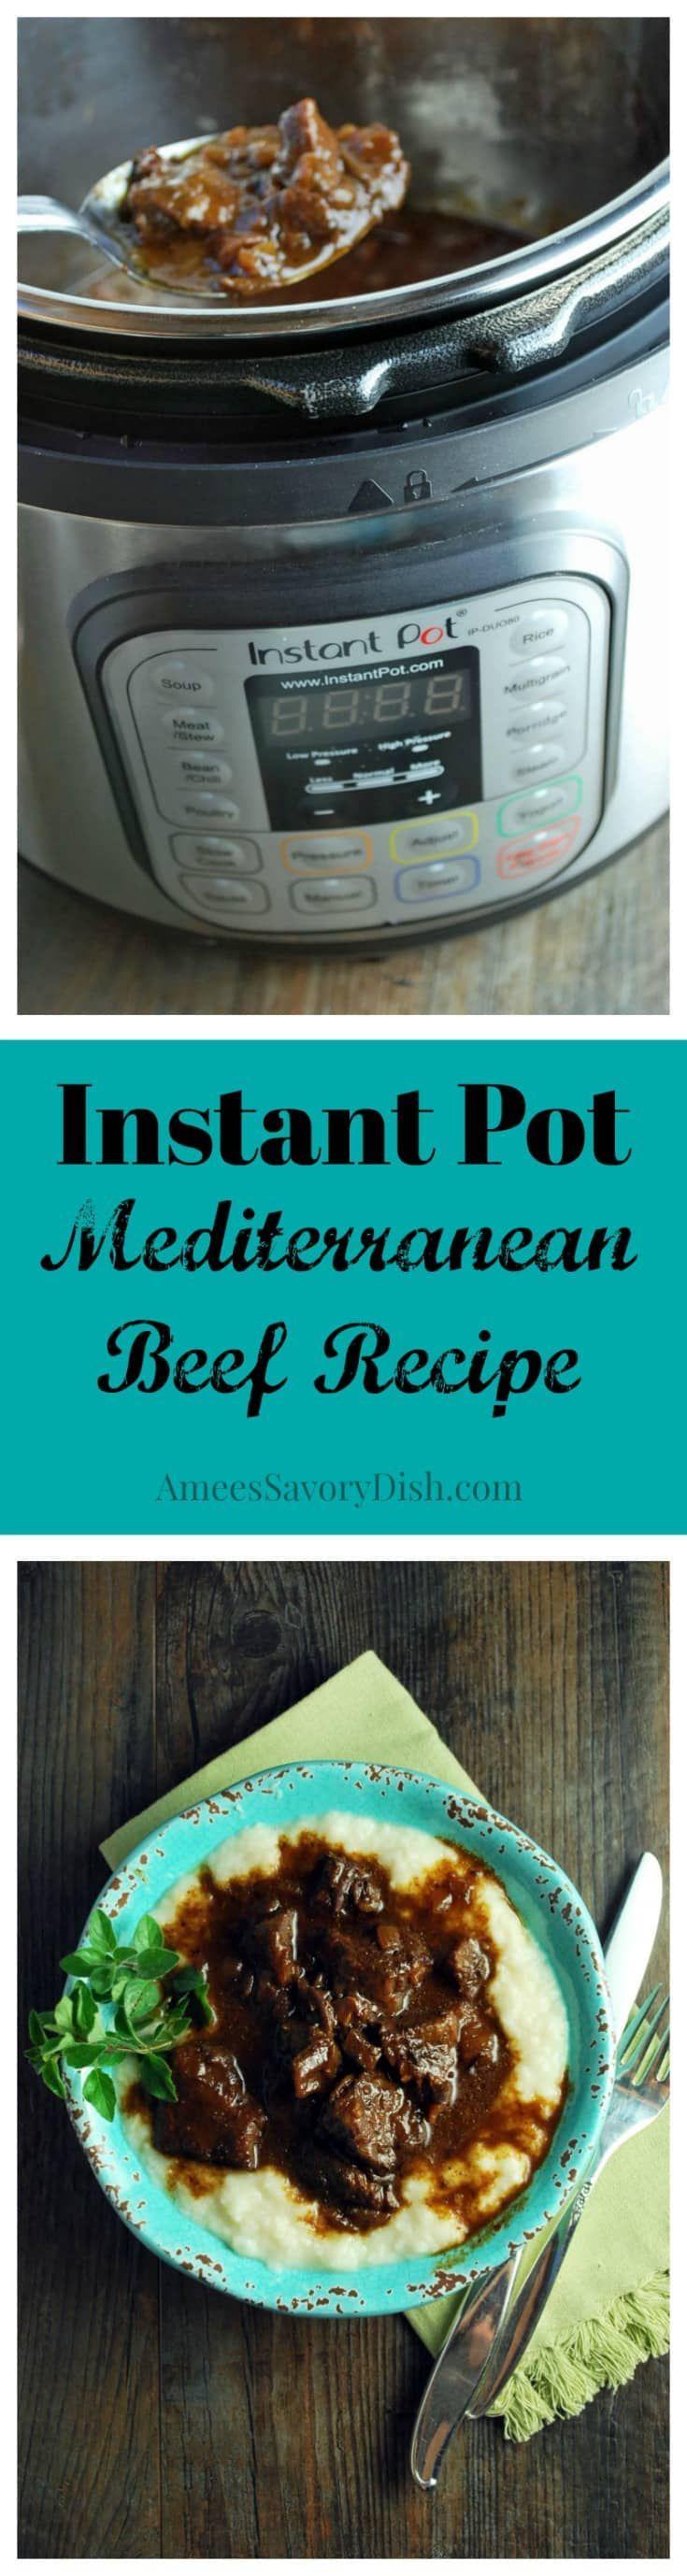 Instant Pot Mediterranean Beef | Recipe | Instant Pot | Pinterest ...